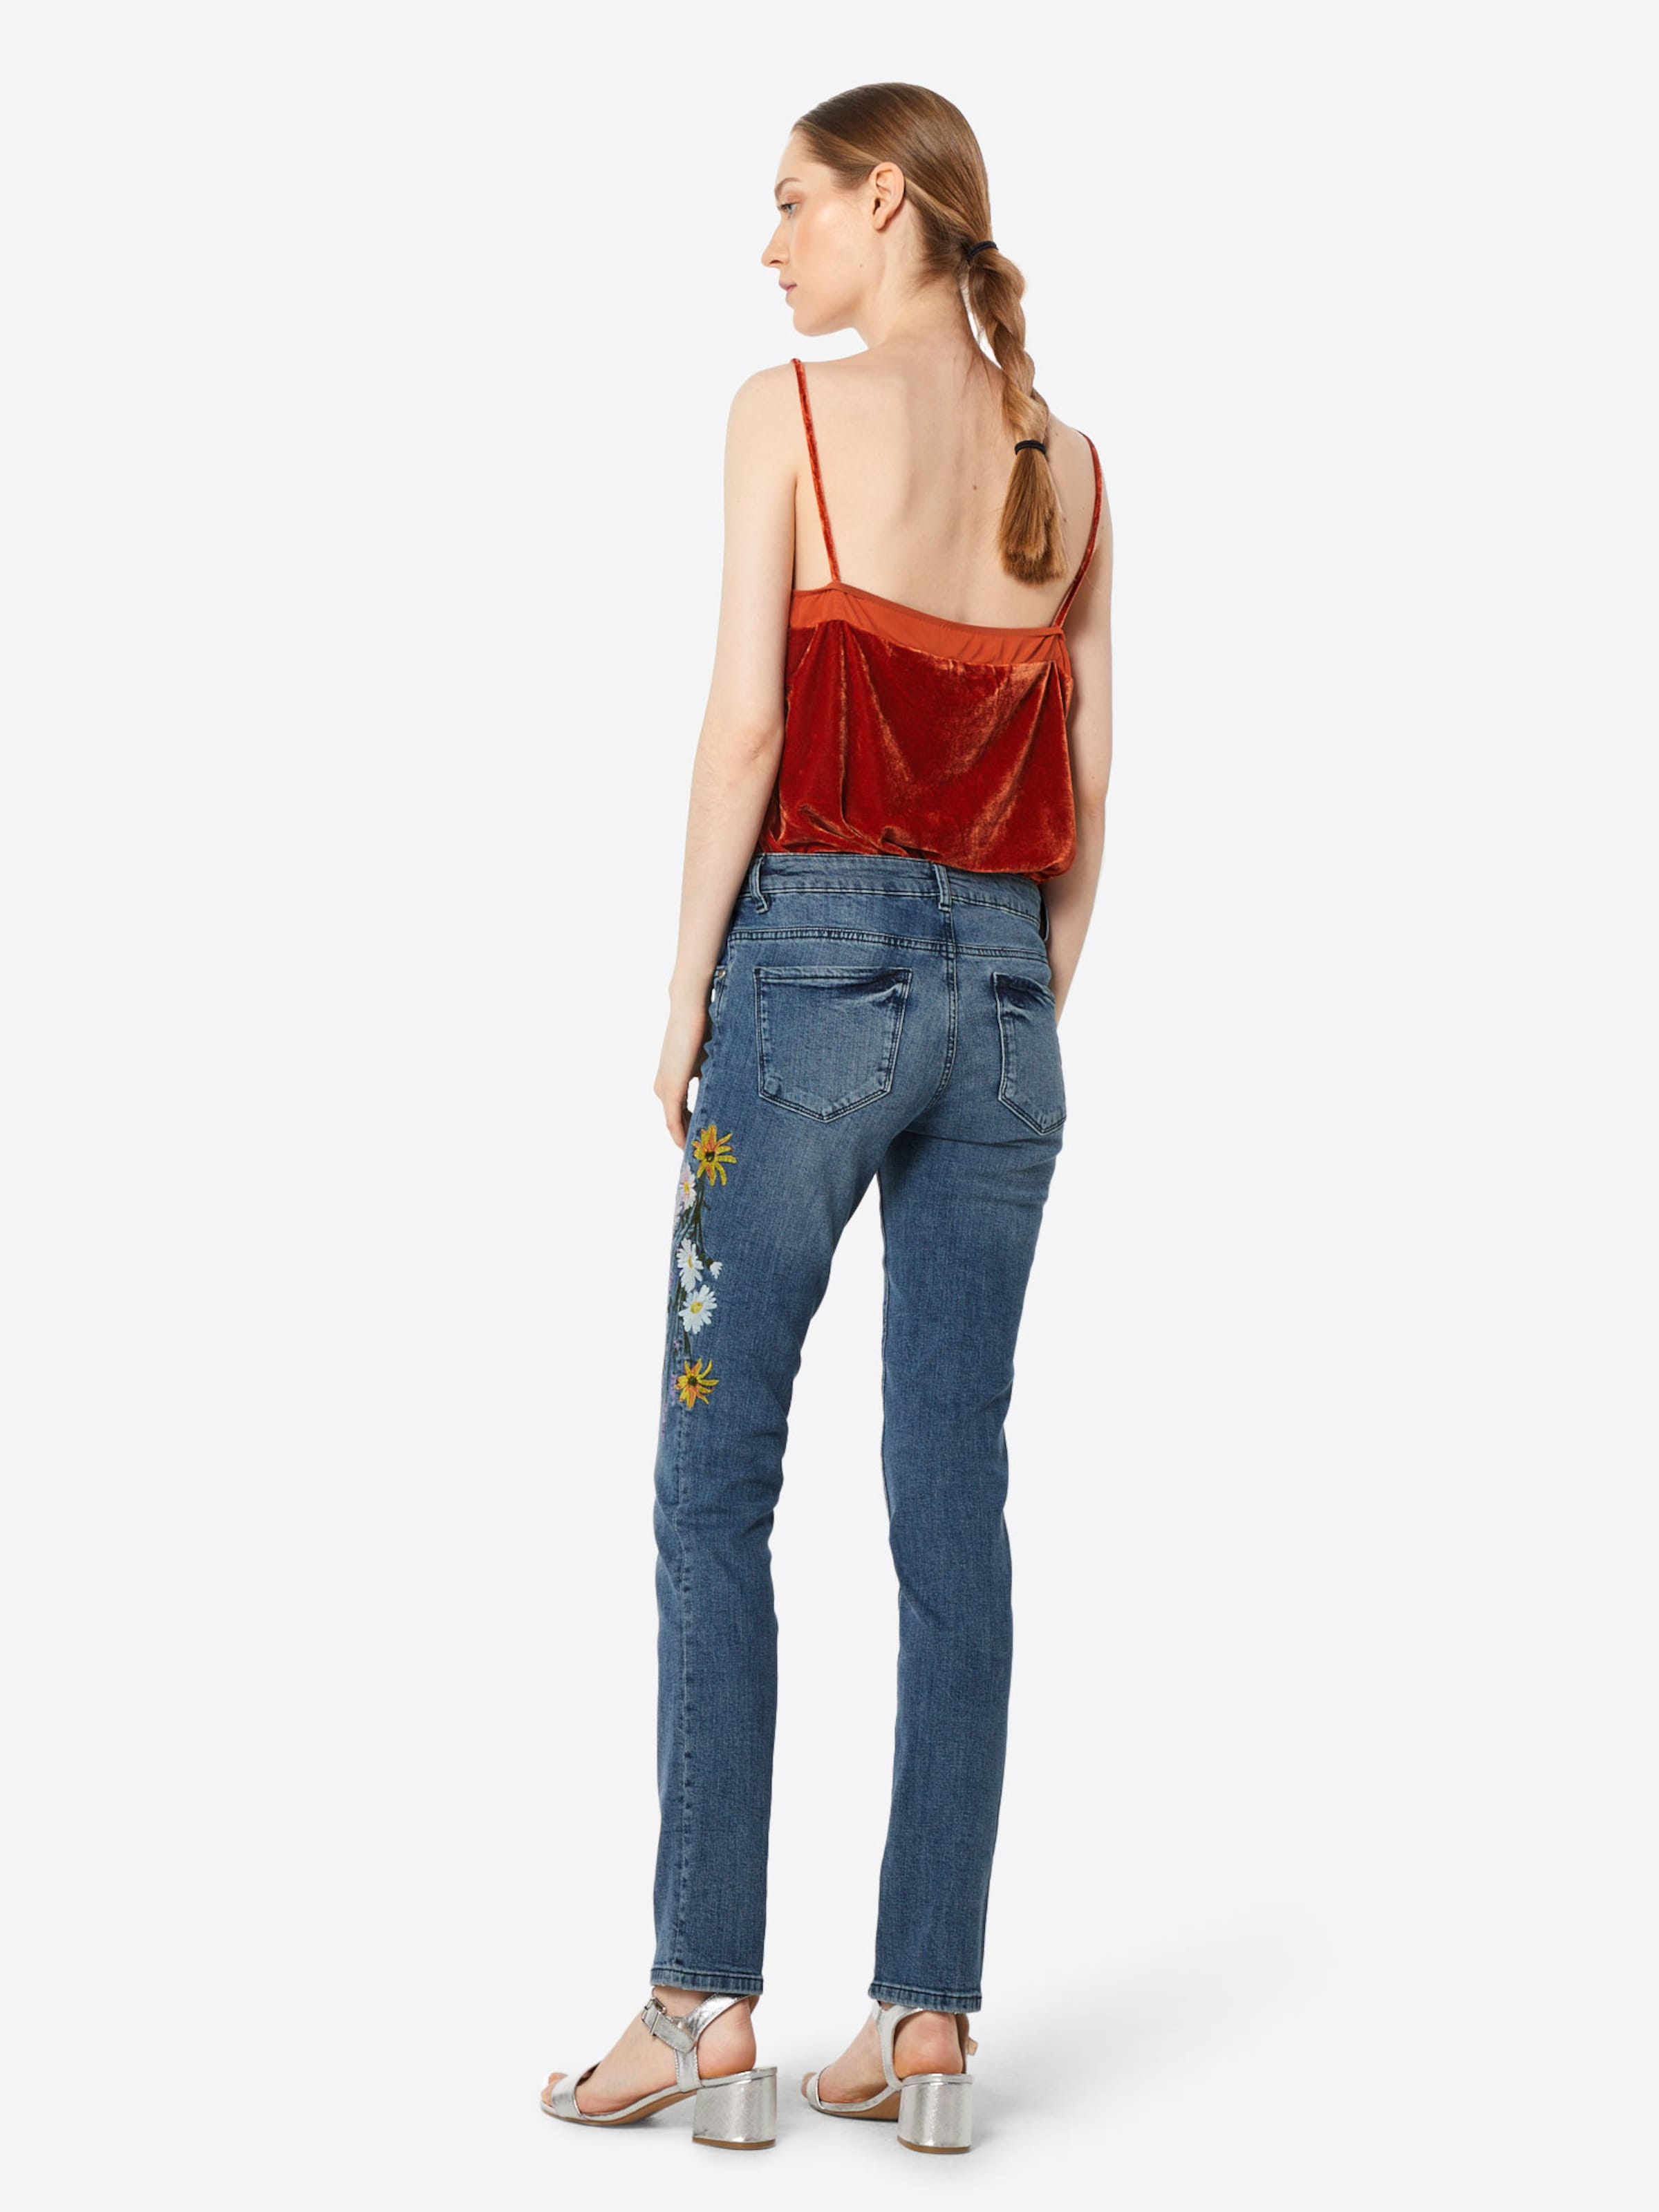 Tom Tailor Slimfit 'alexa' Blau In Jeans deCoxB